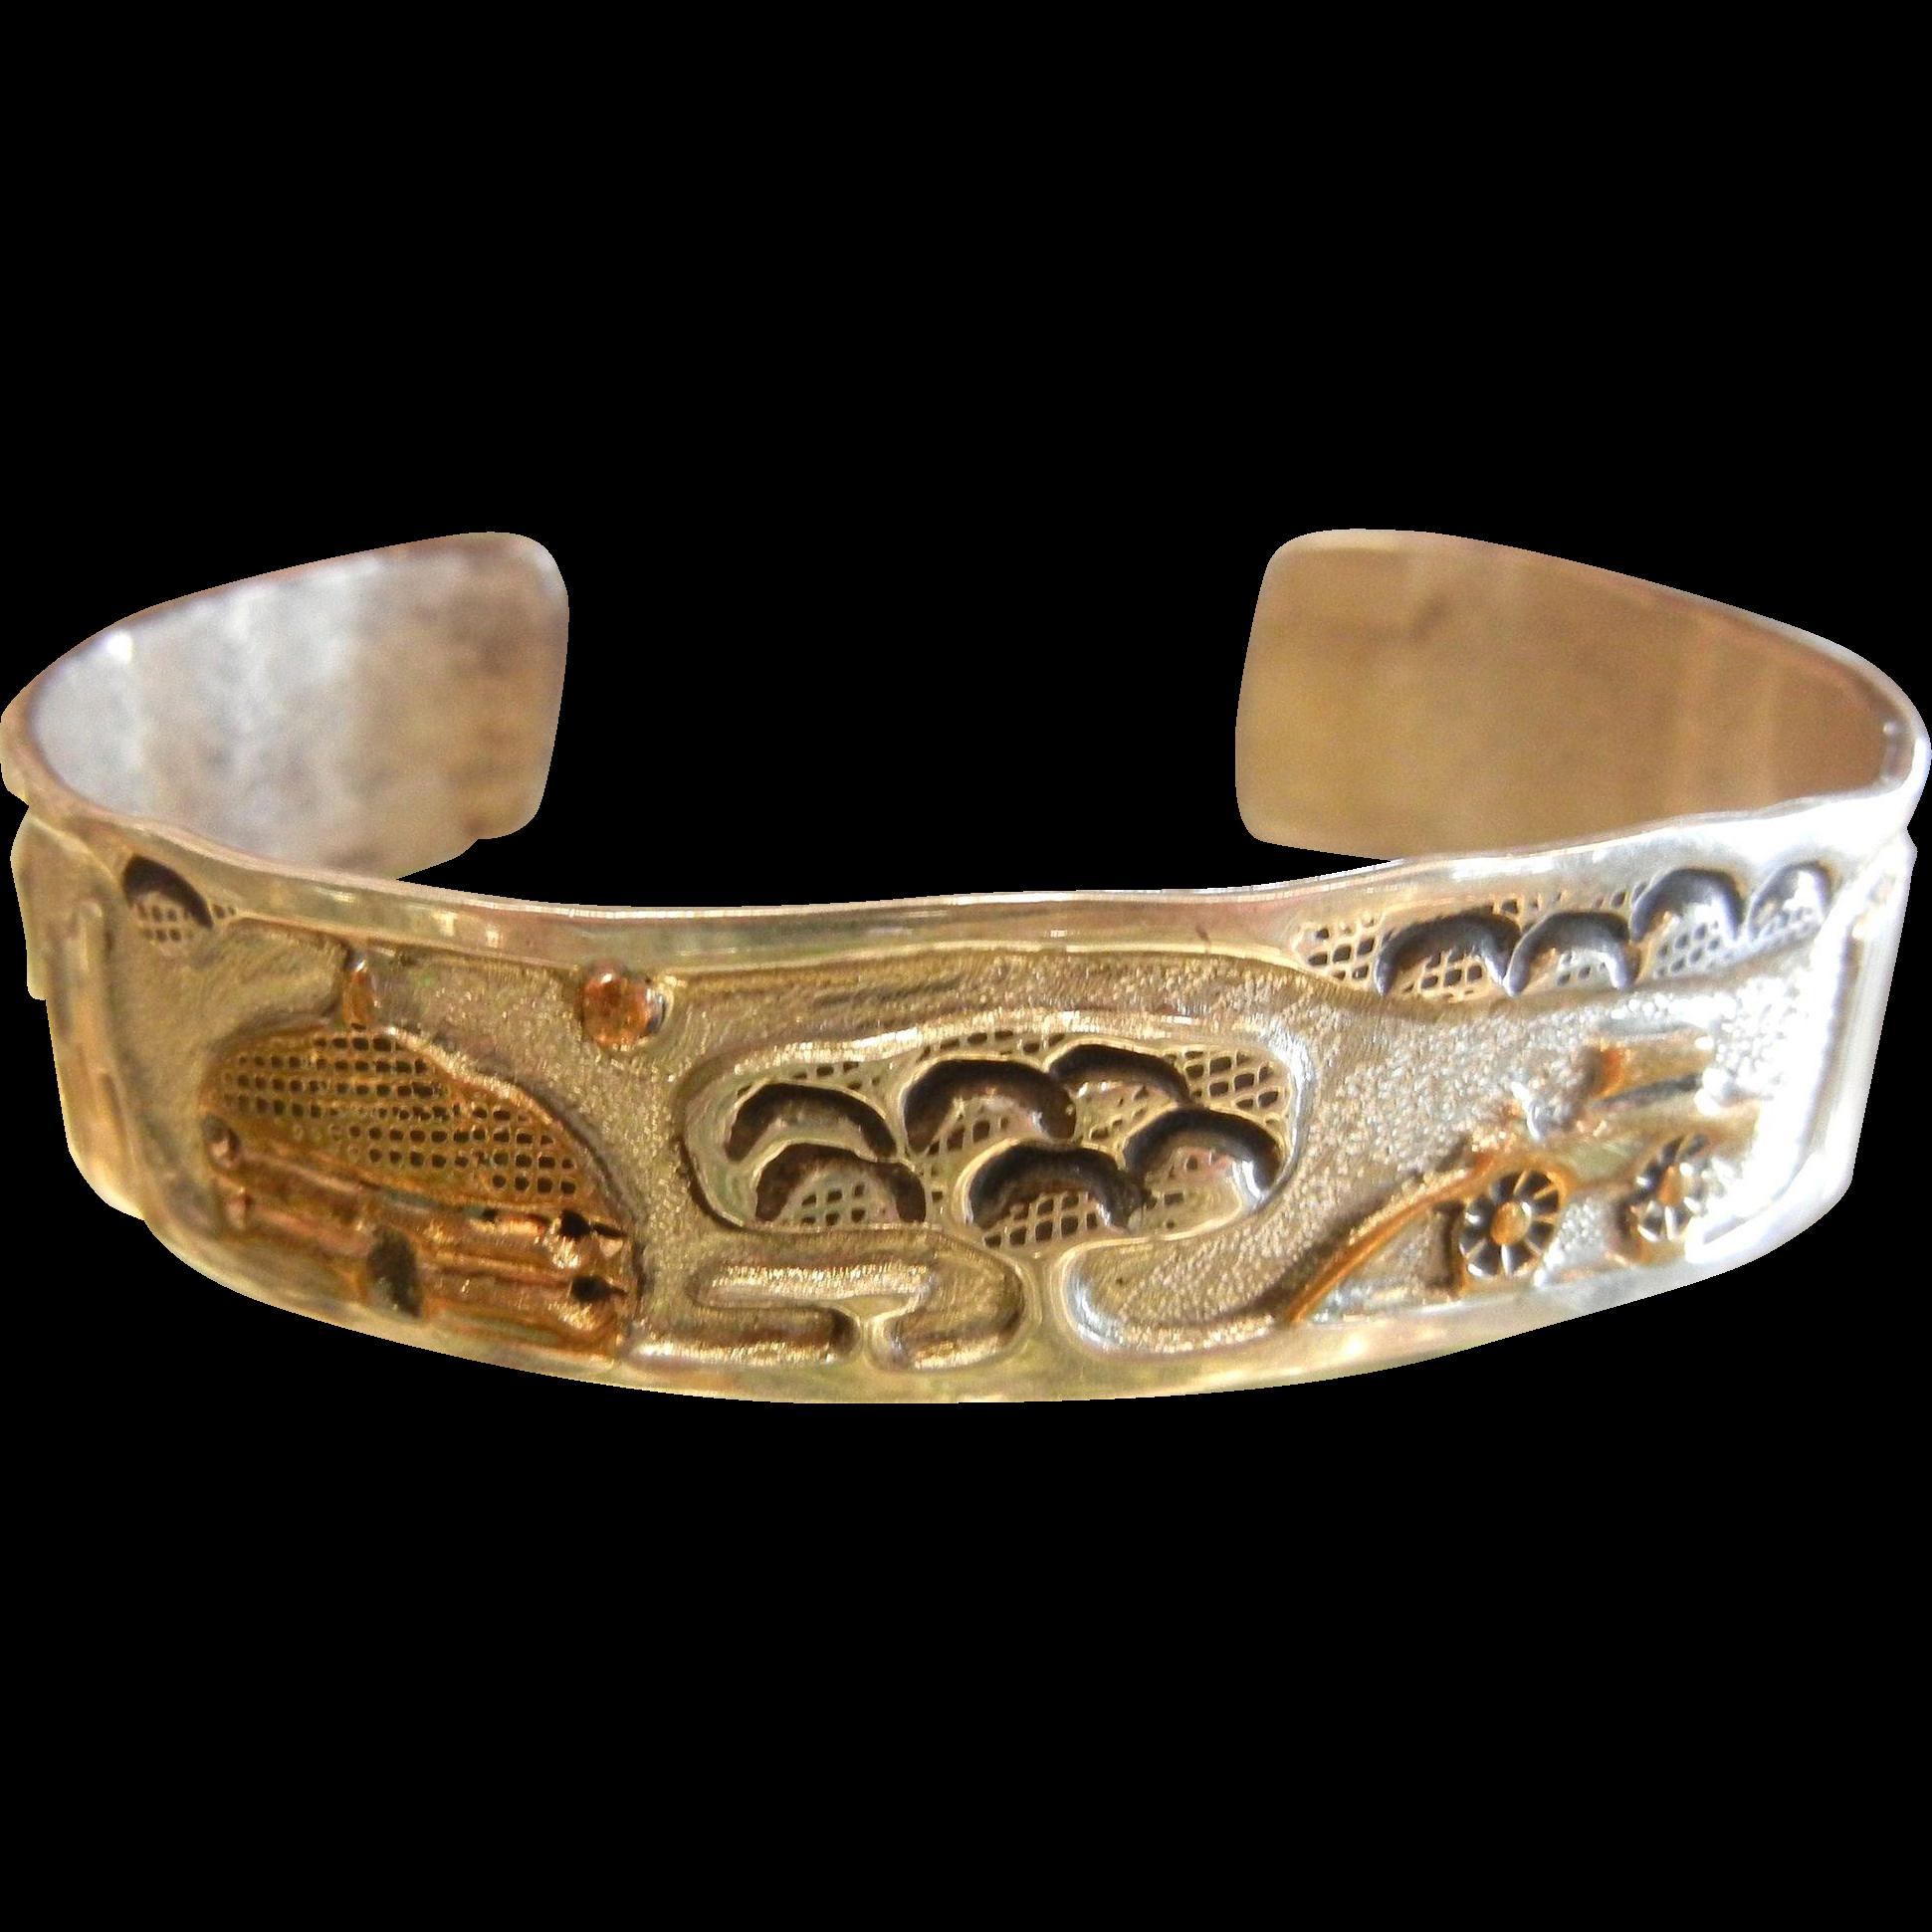 Vintage Navajo Story Teller Sterling Silver Cuff Bracelet - Signed A. Henry